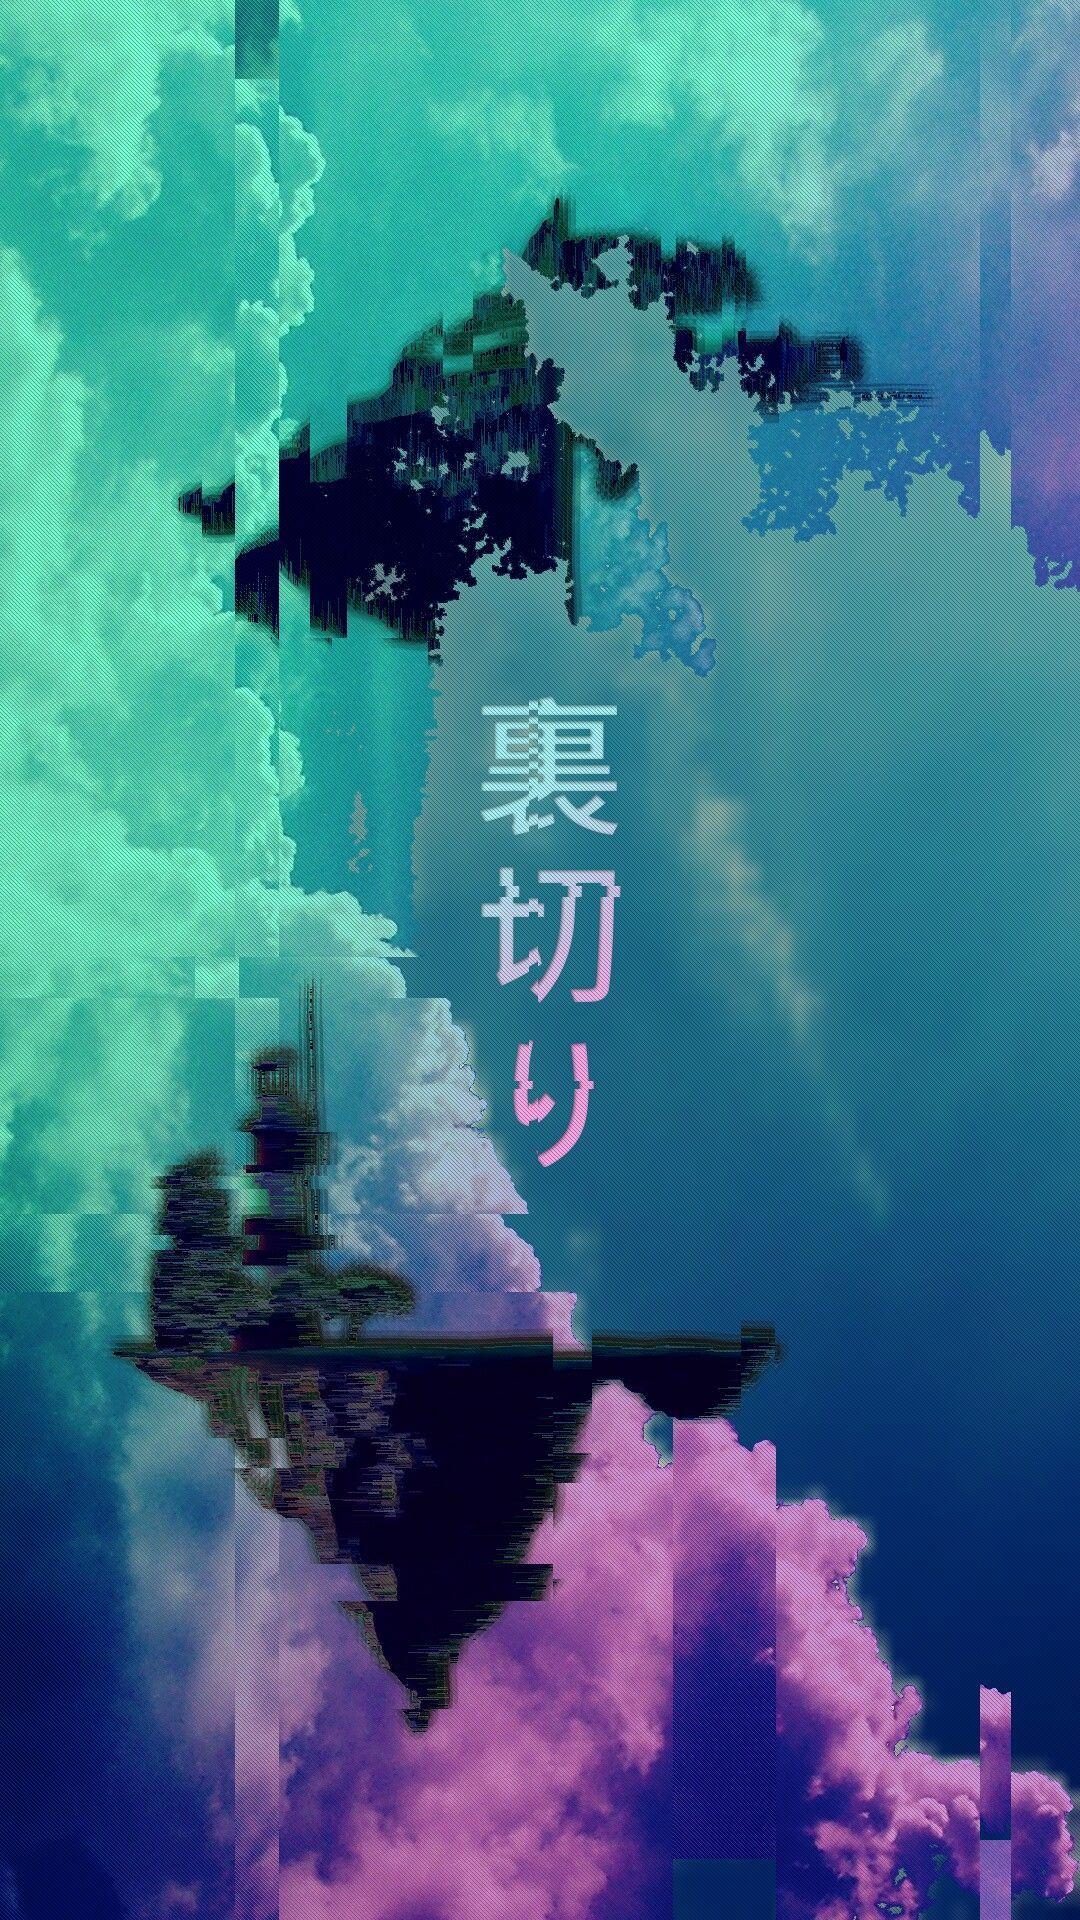 27+ Lofi Anime Aesthetic iPad Wallpapers on WallpaperSafari